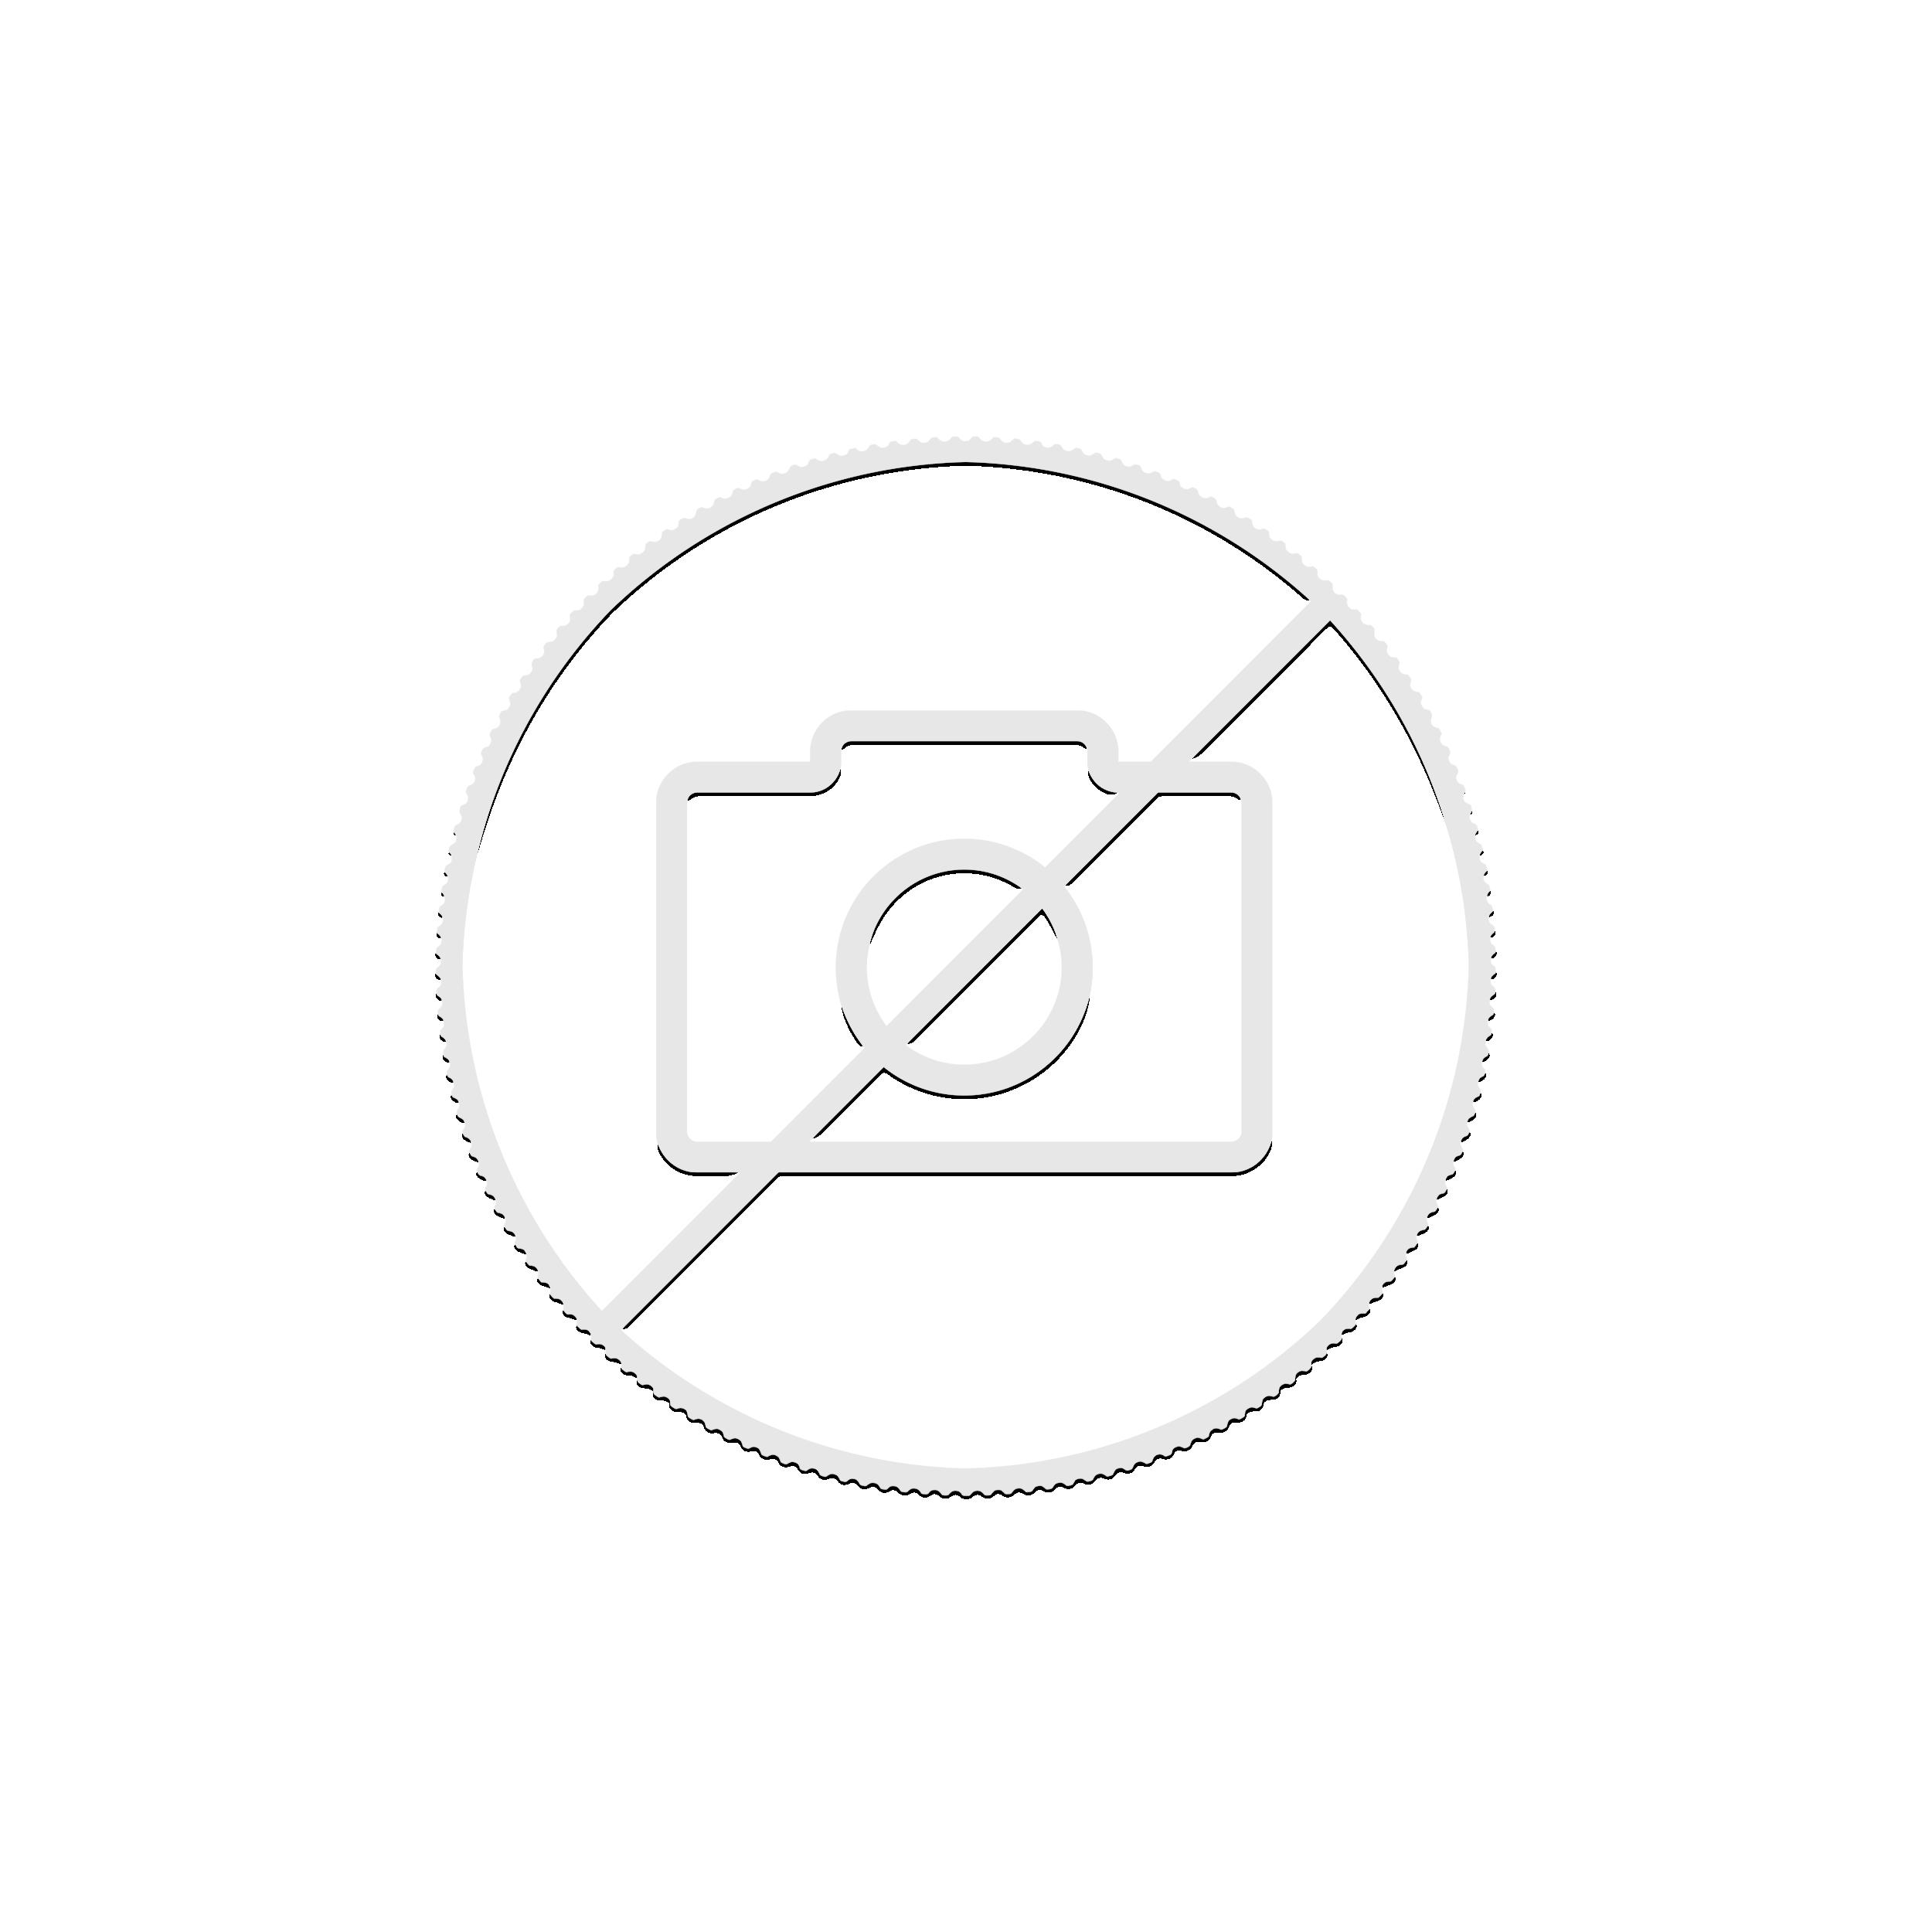 1 Troy ounce zilveren munt Golden Ring serie - Robin Hood 21